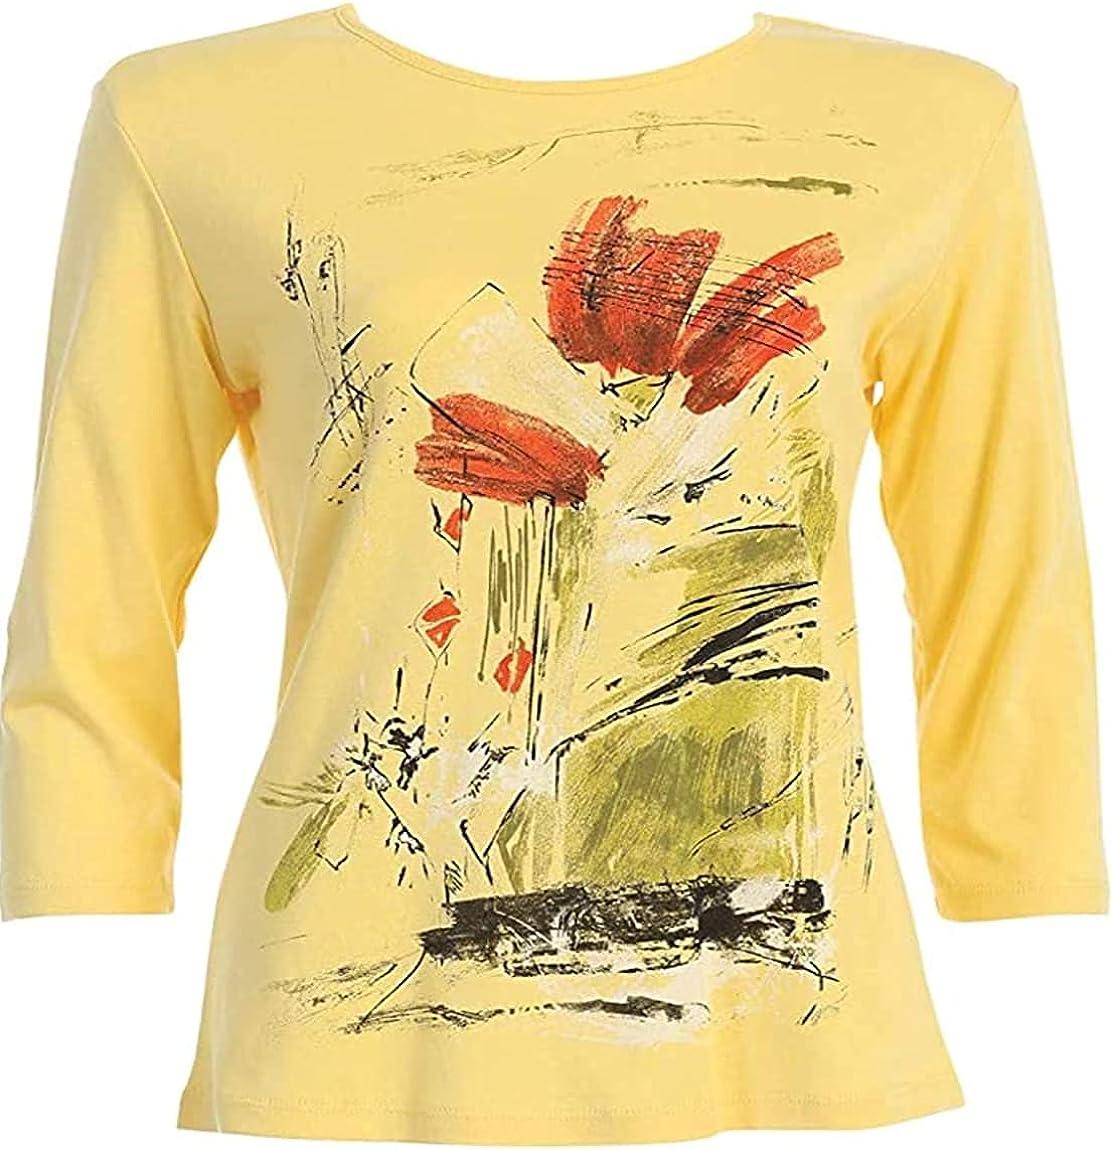 Jess & Jane Women's Celine Cotton Tee Shirt Top